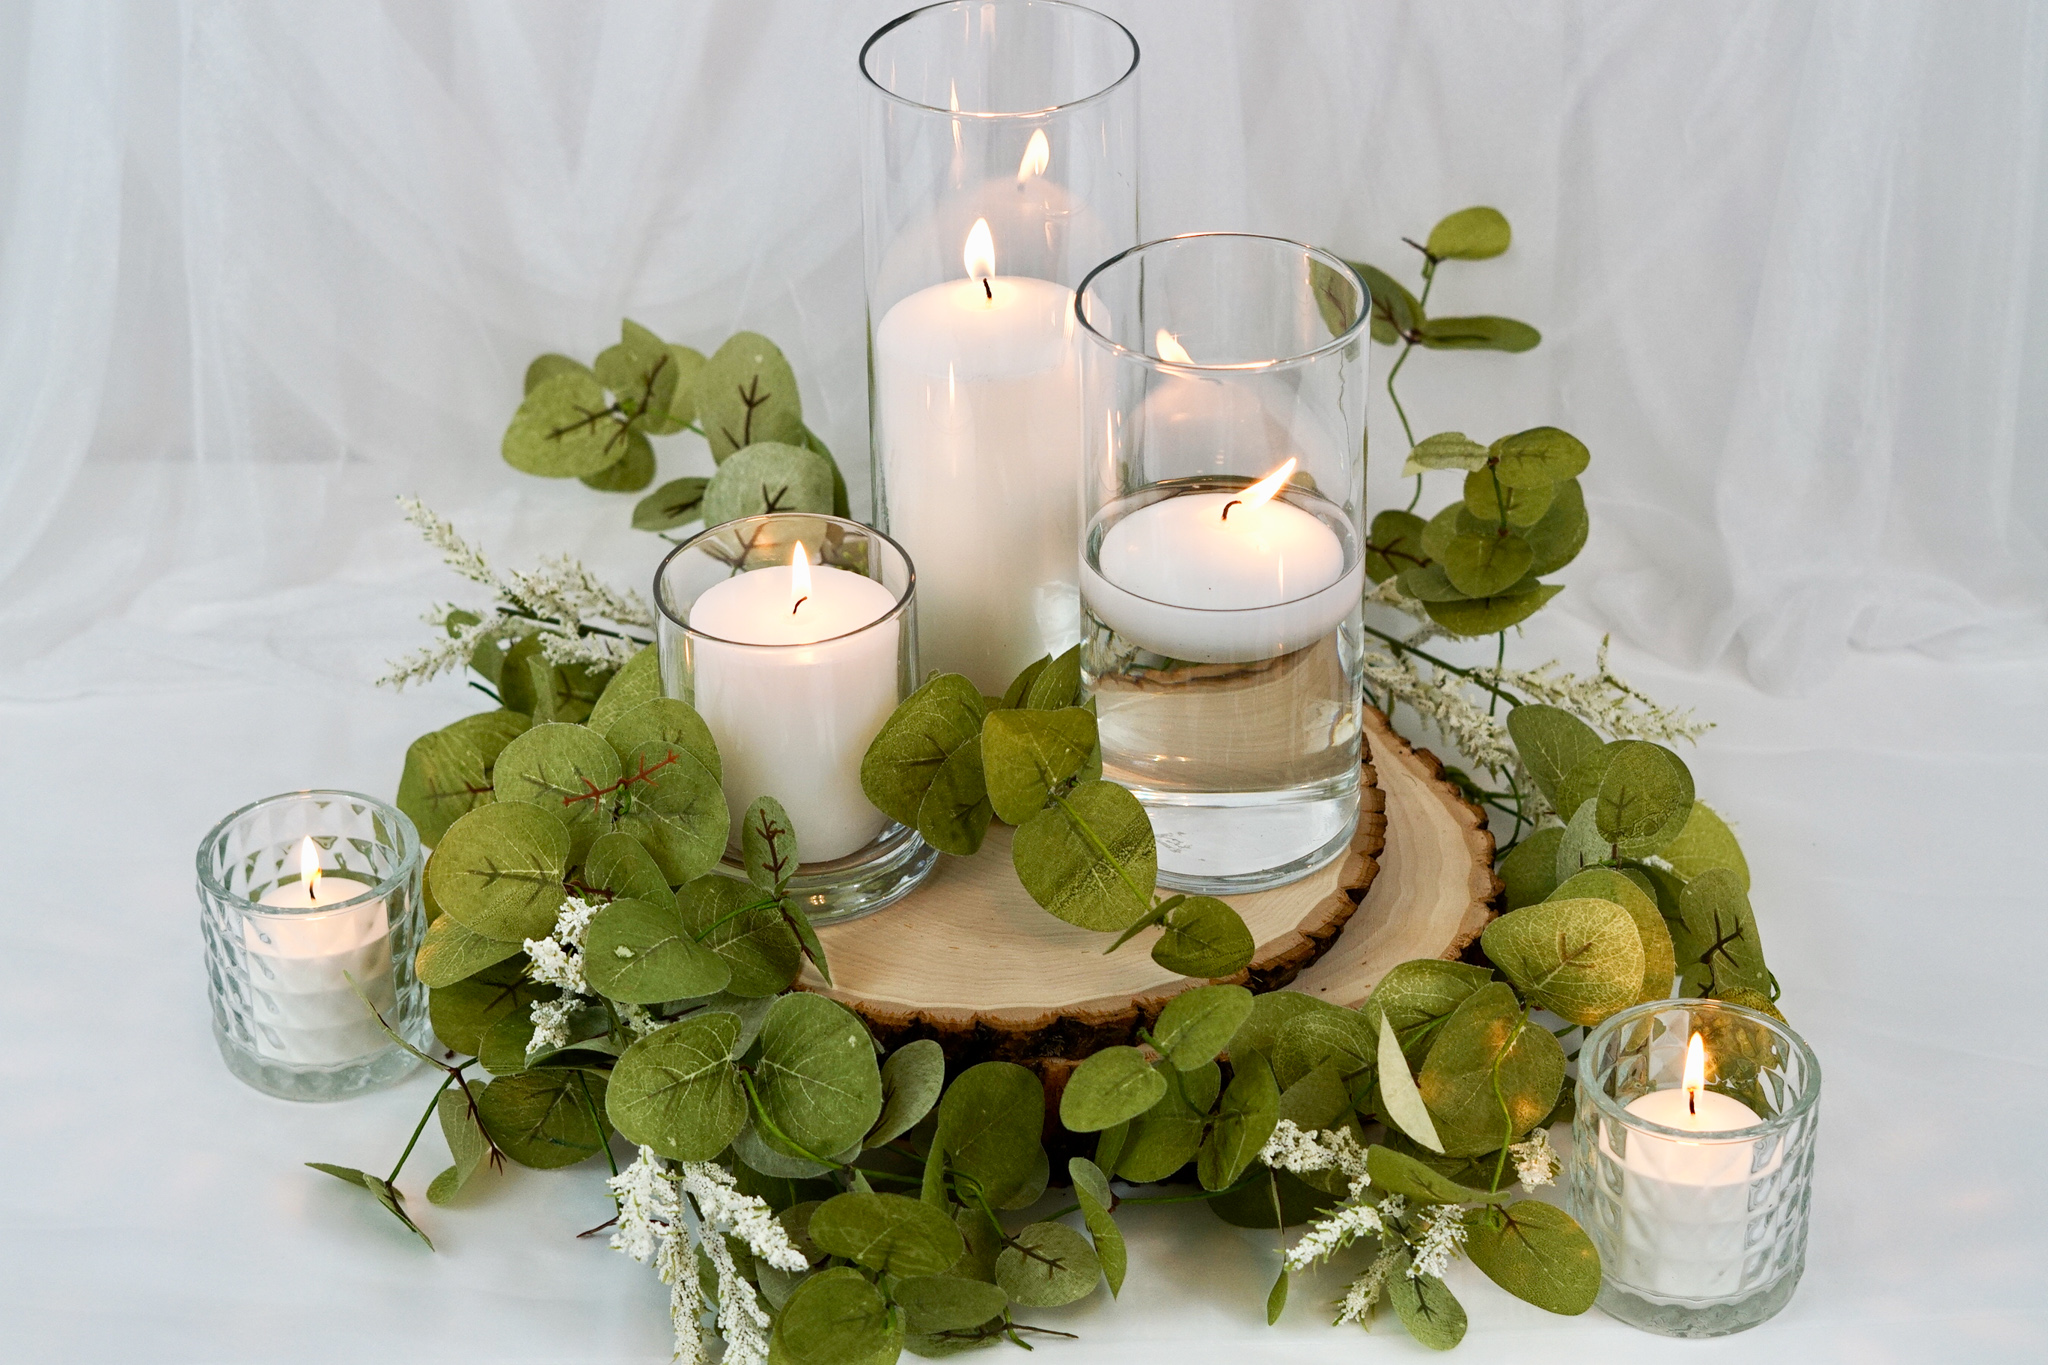 Amazing Diy Wedding Centerpieces Using 1 Dollar Tree Vases